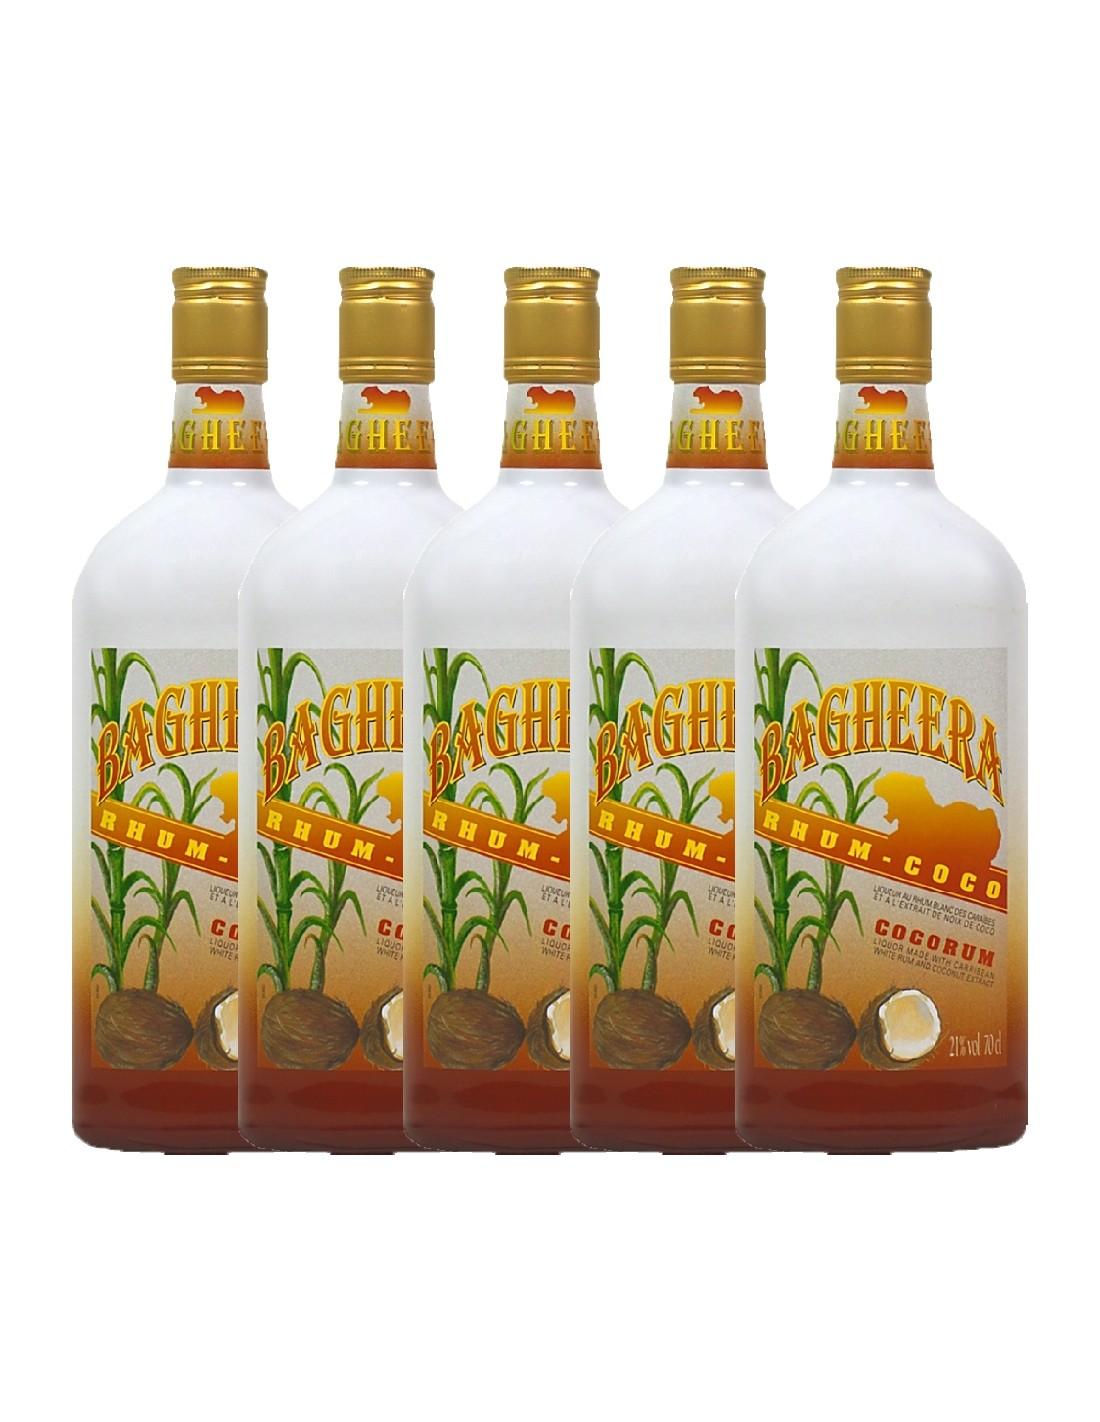 Pachet 5 sticle Rom cocos Bagheera, 21% alc., 0.7L